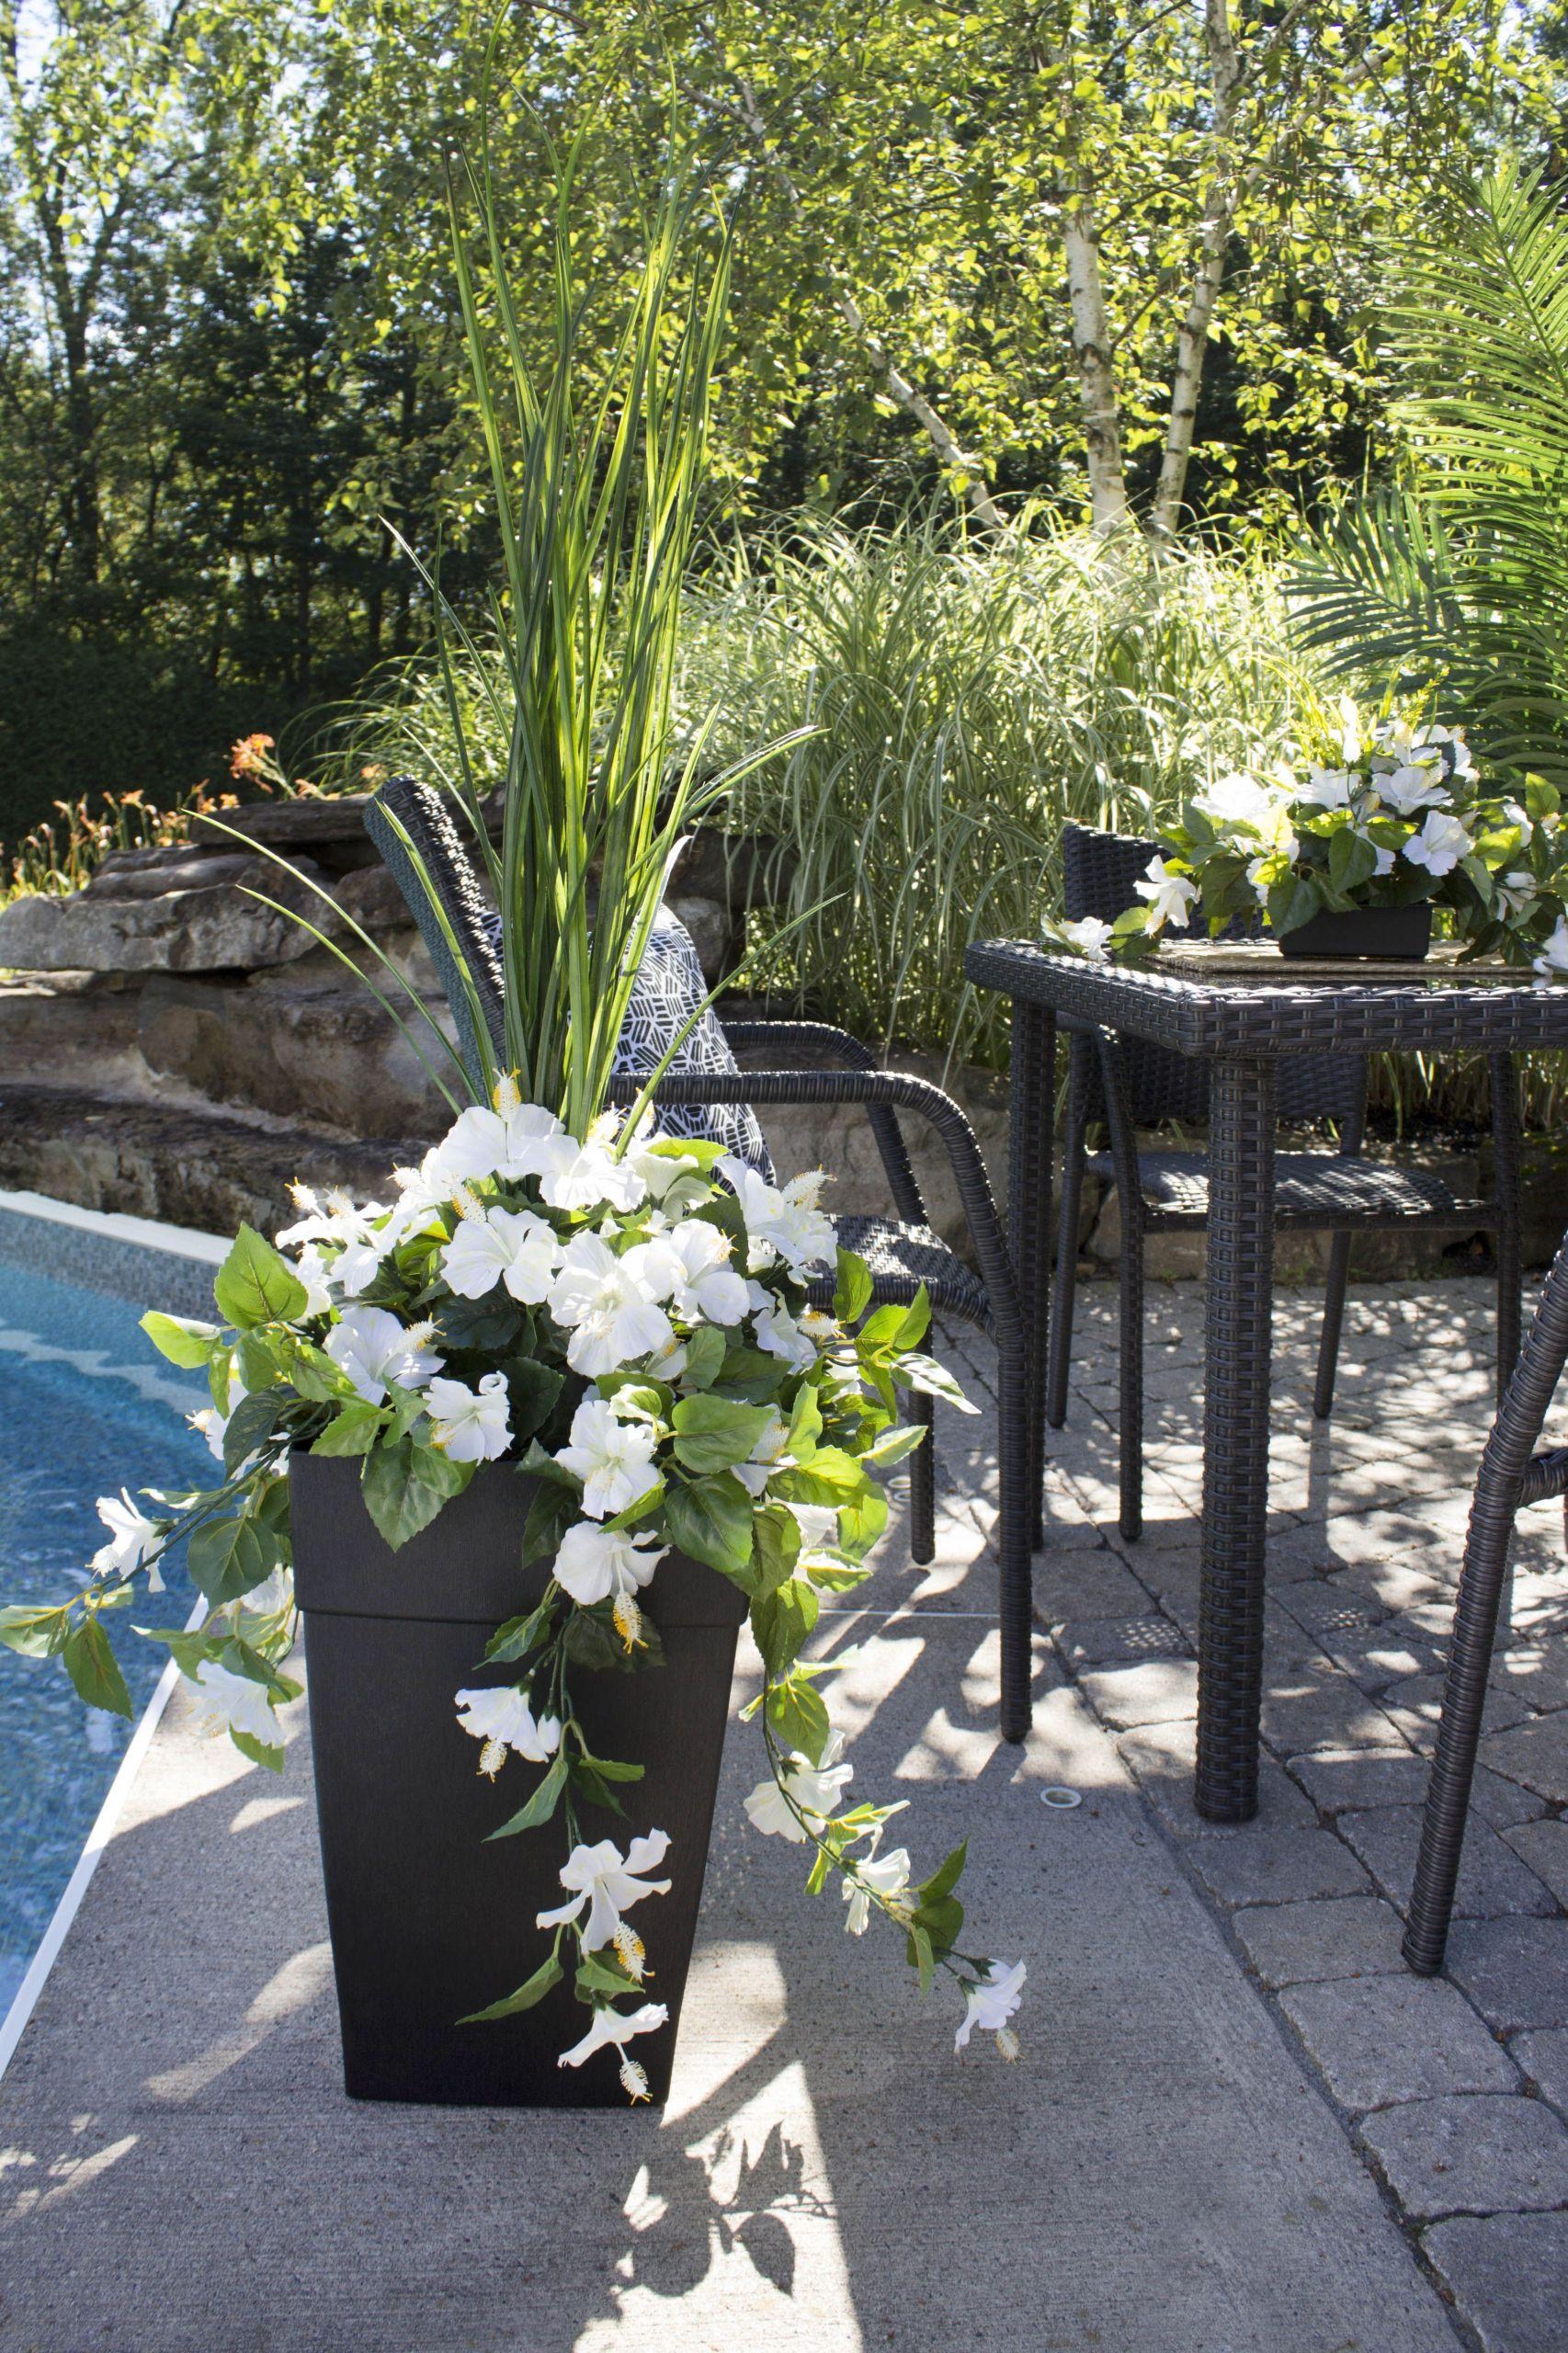 Jardin Service Frais 19 Tantalizing Plants Indoor Products Ideas Of 45 Nouveau Jardin Service